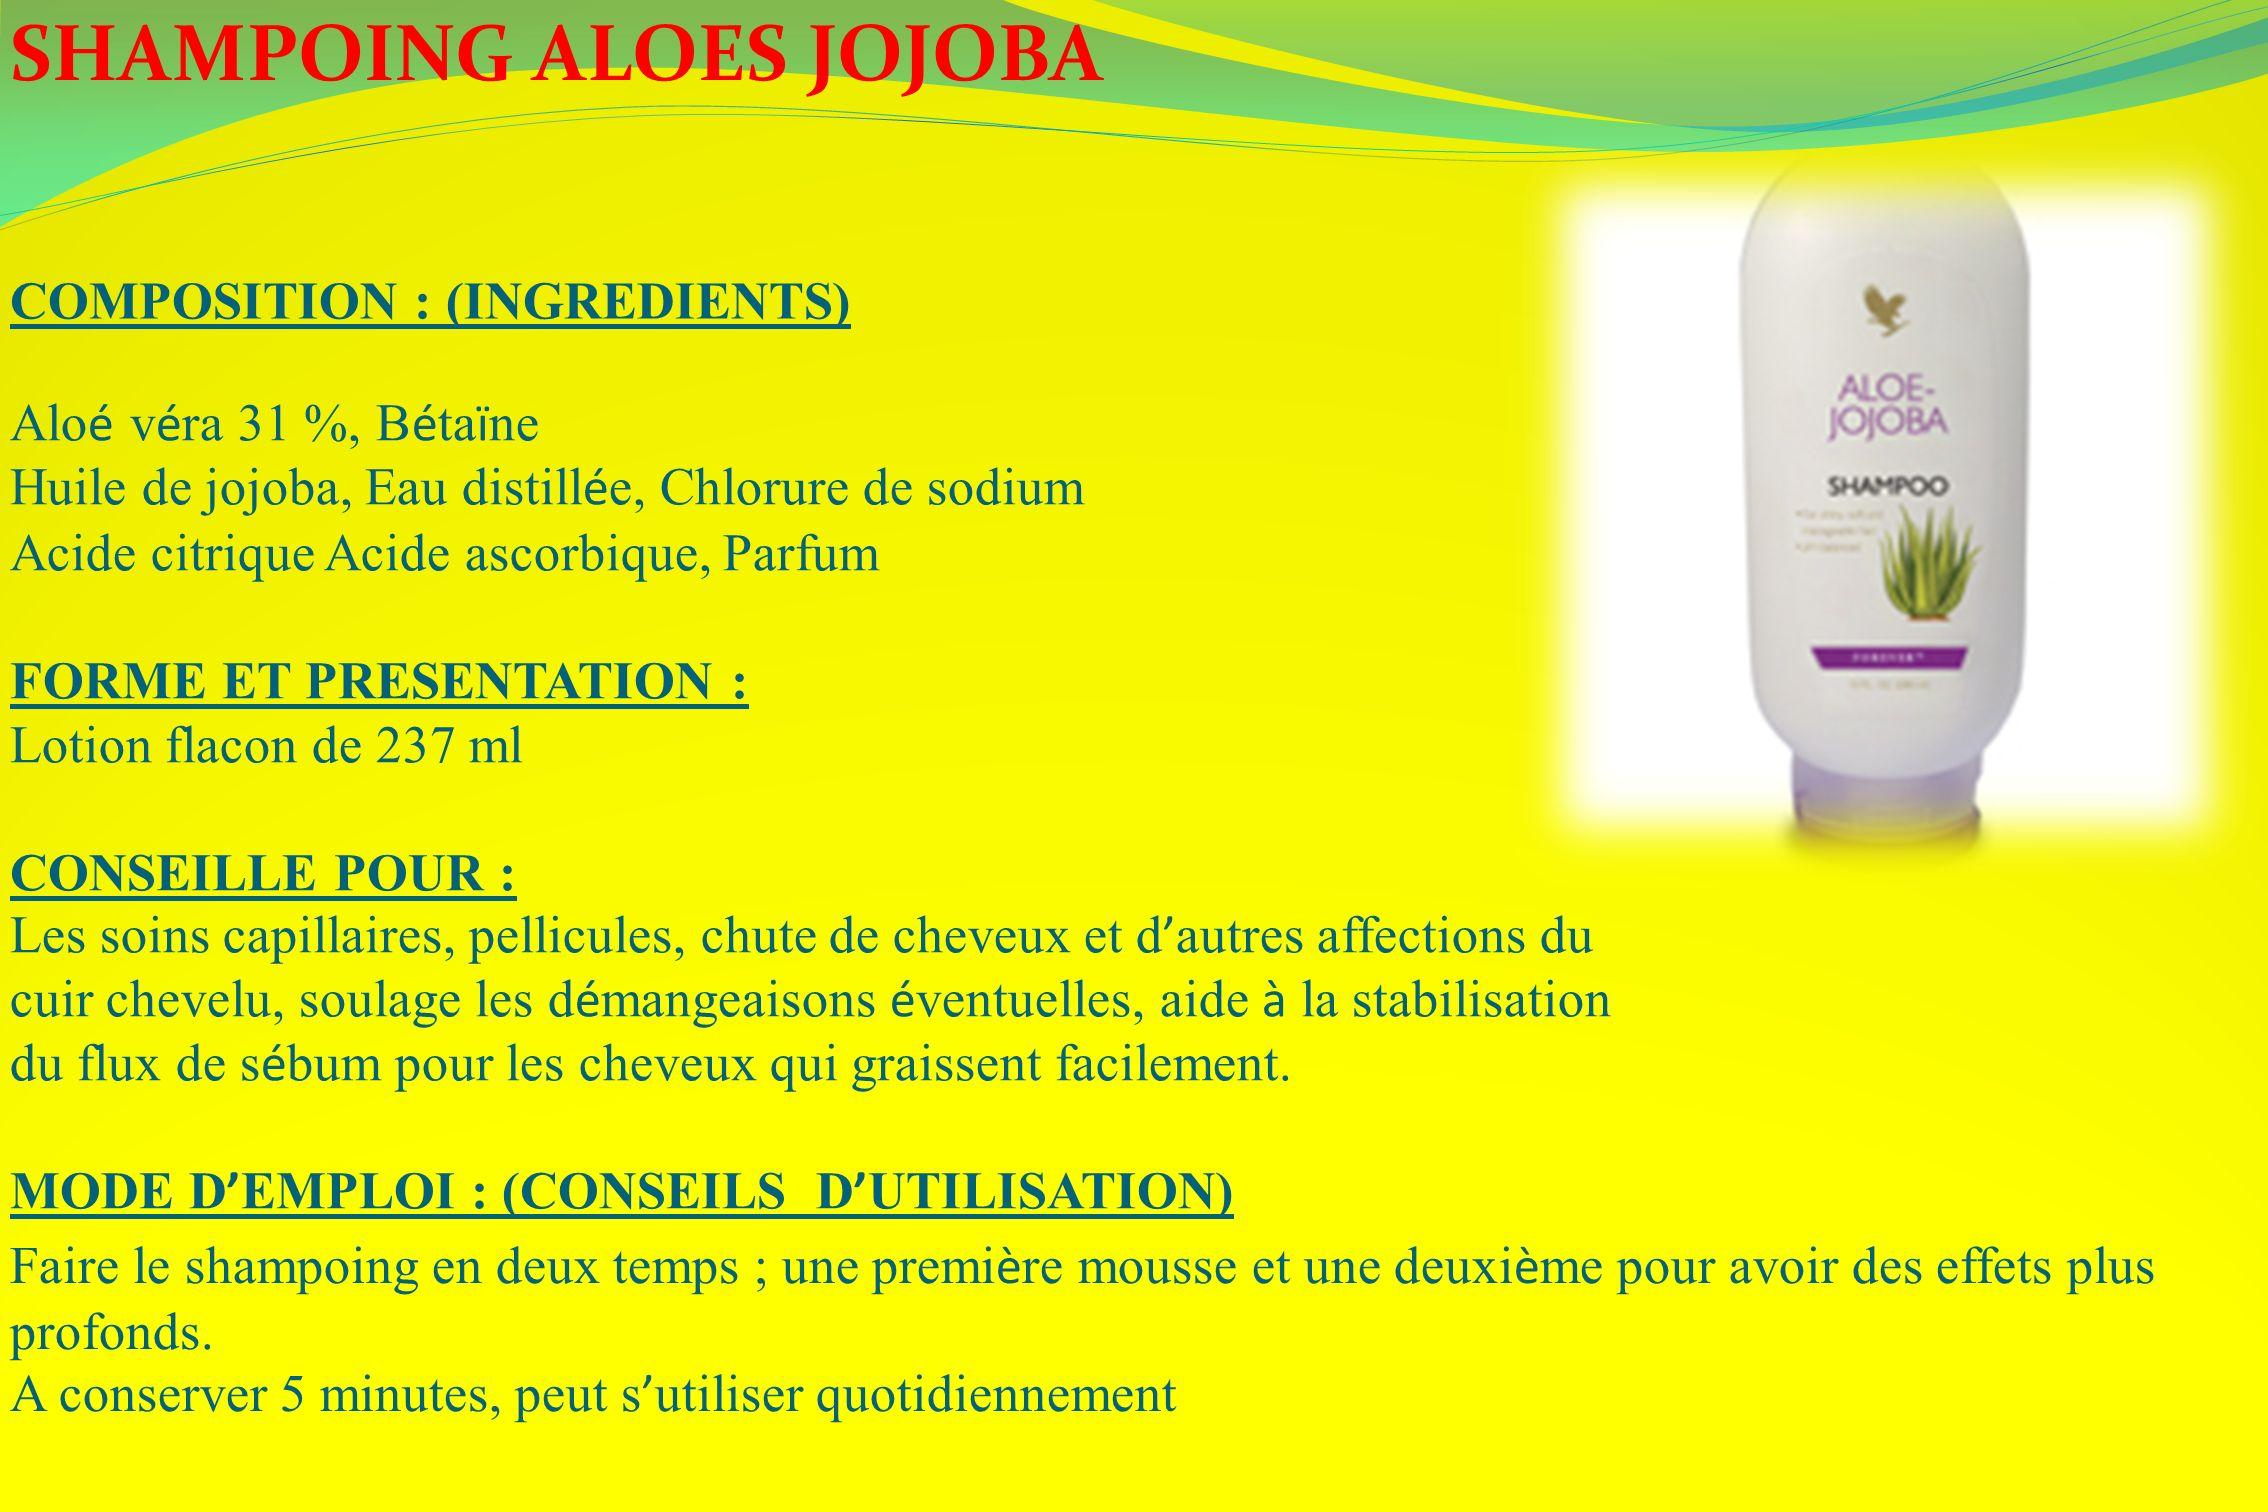 SHAMPOING ALOES JOJOBA COMPOSITION : (INGREDIENTS) Alo é v é ra 31 %, B é ta ï ne Huile de jojoba, Eau distill é e, Chlorure de sodium Acide citrique